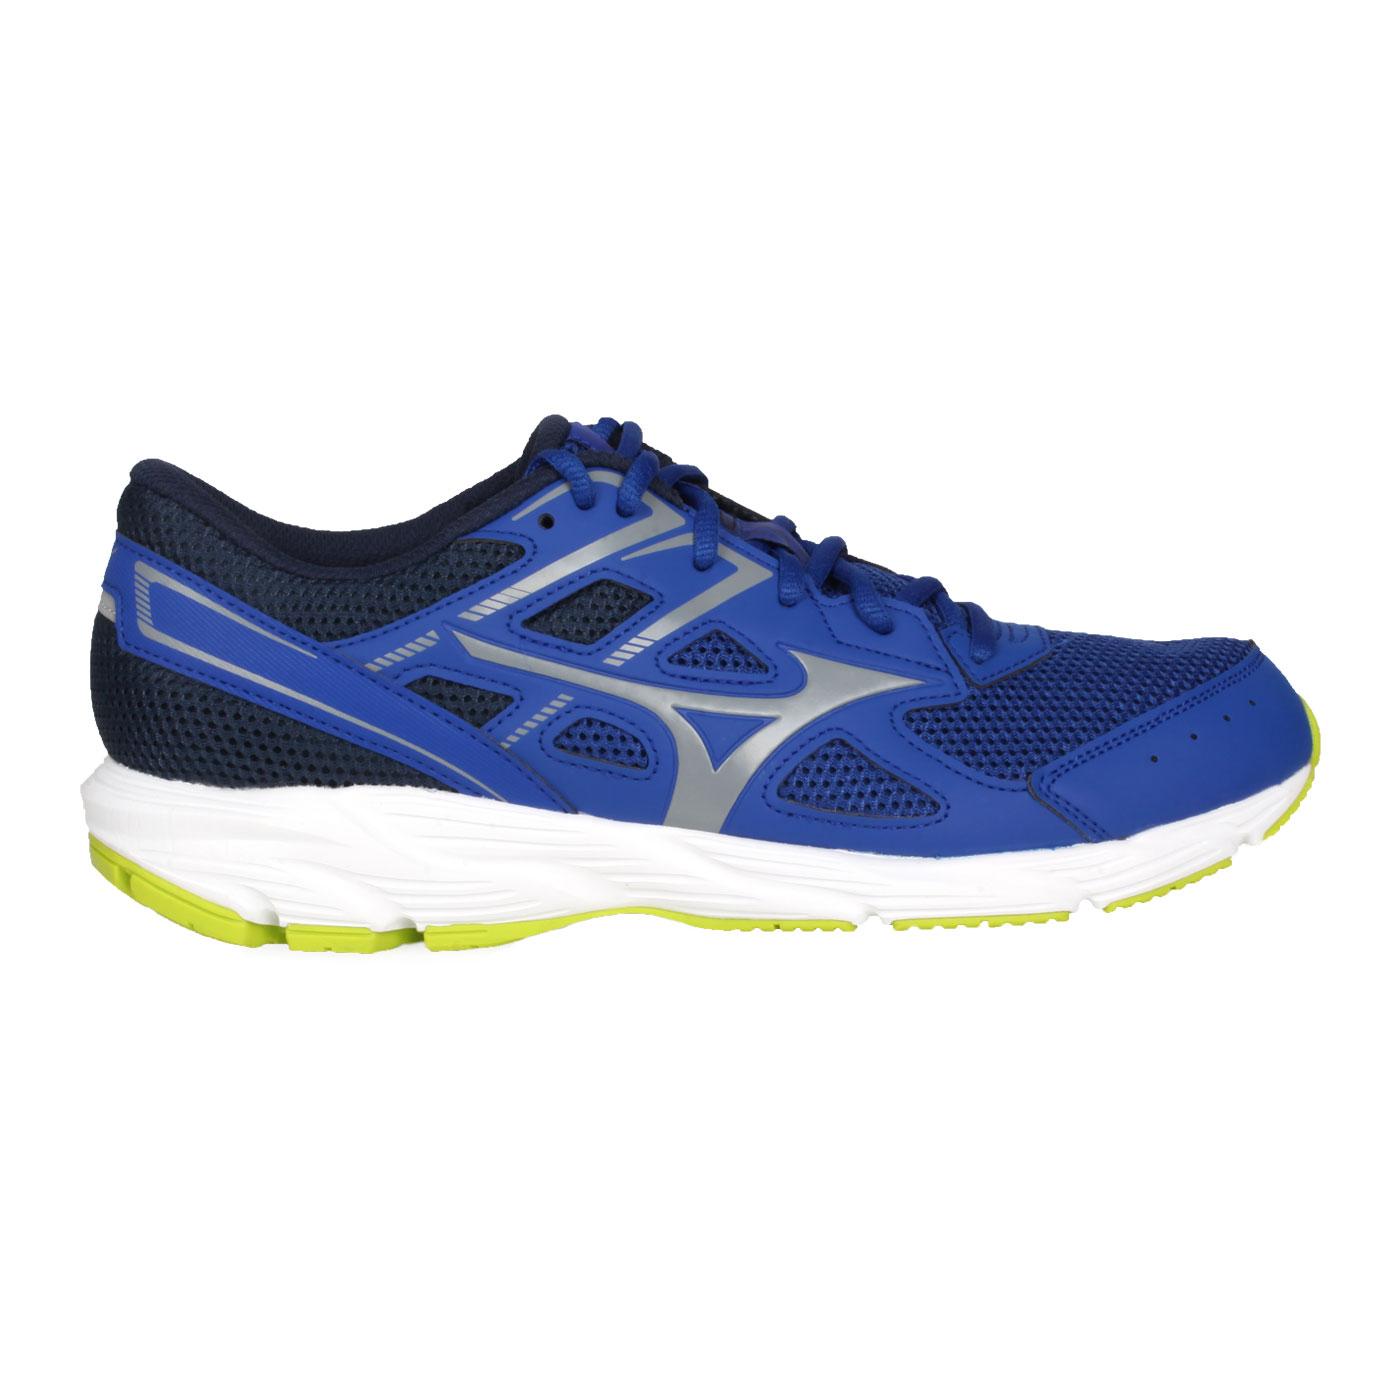 MIZUNO 男款慢跑鞋  @ SPARK 6@K1GA210340 - 丈青藍灰